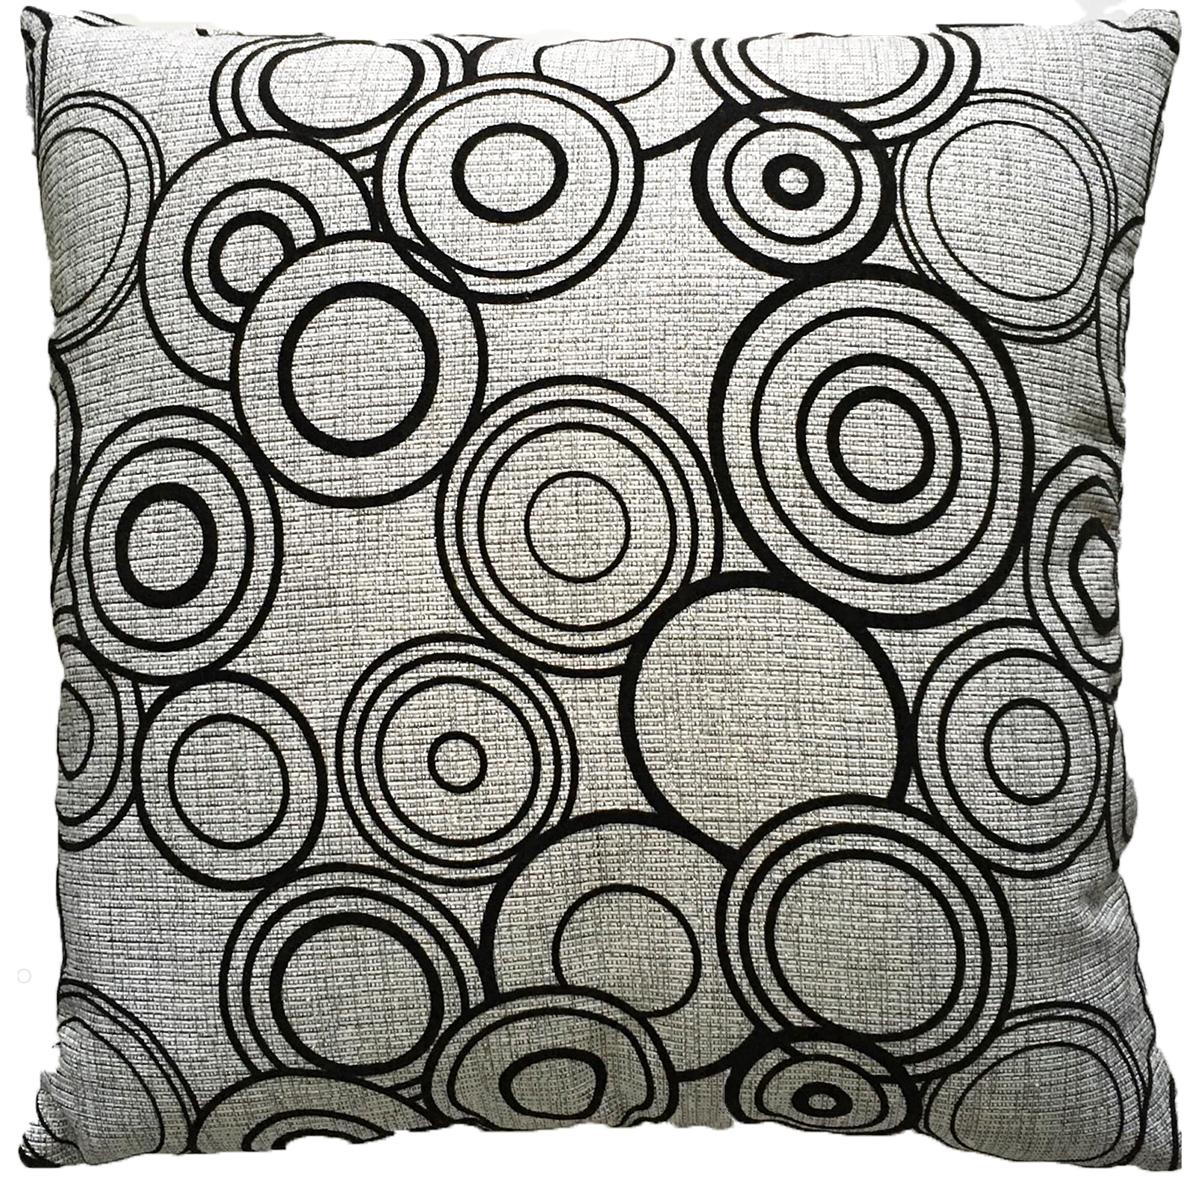 Възглавница NAZARE цвят 1 45х45 сиво кръгове